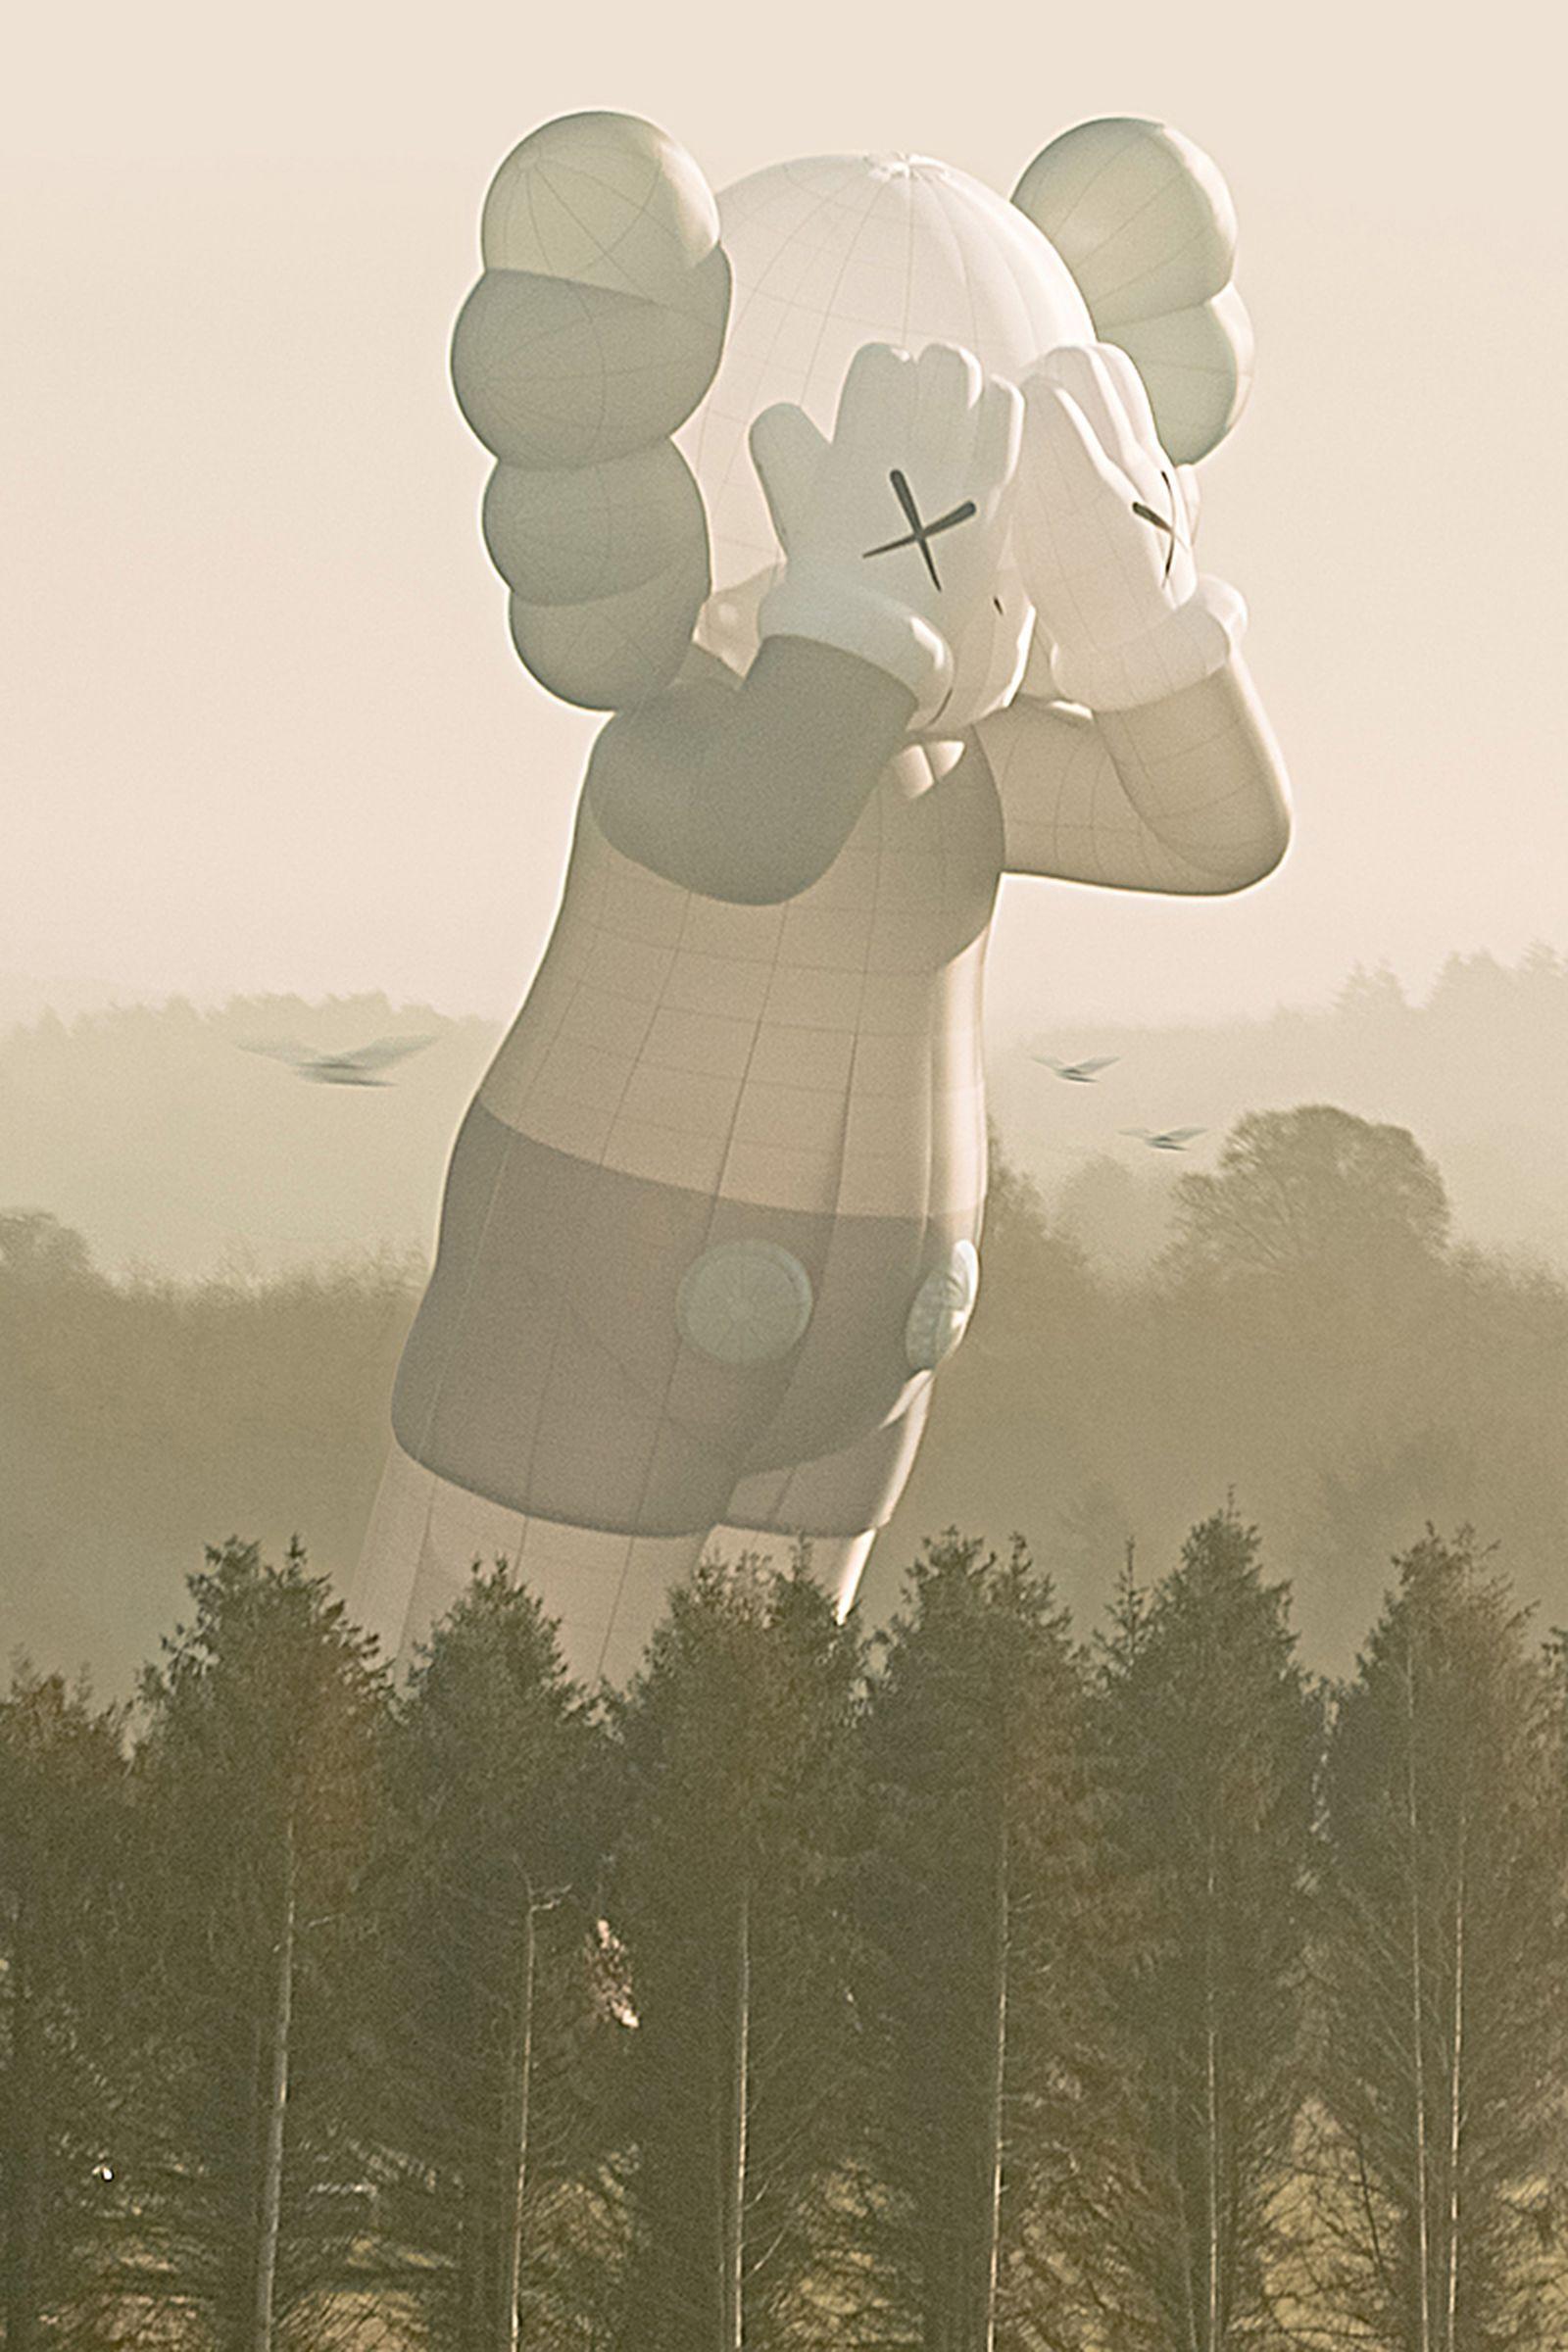 kaws-holiday-bristol-hot-air-balloon-companion (5)